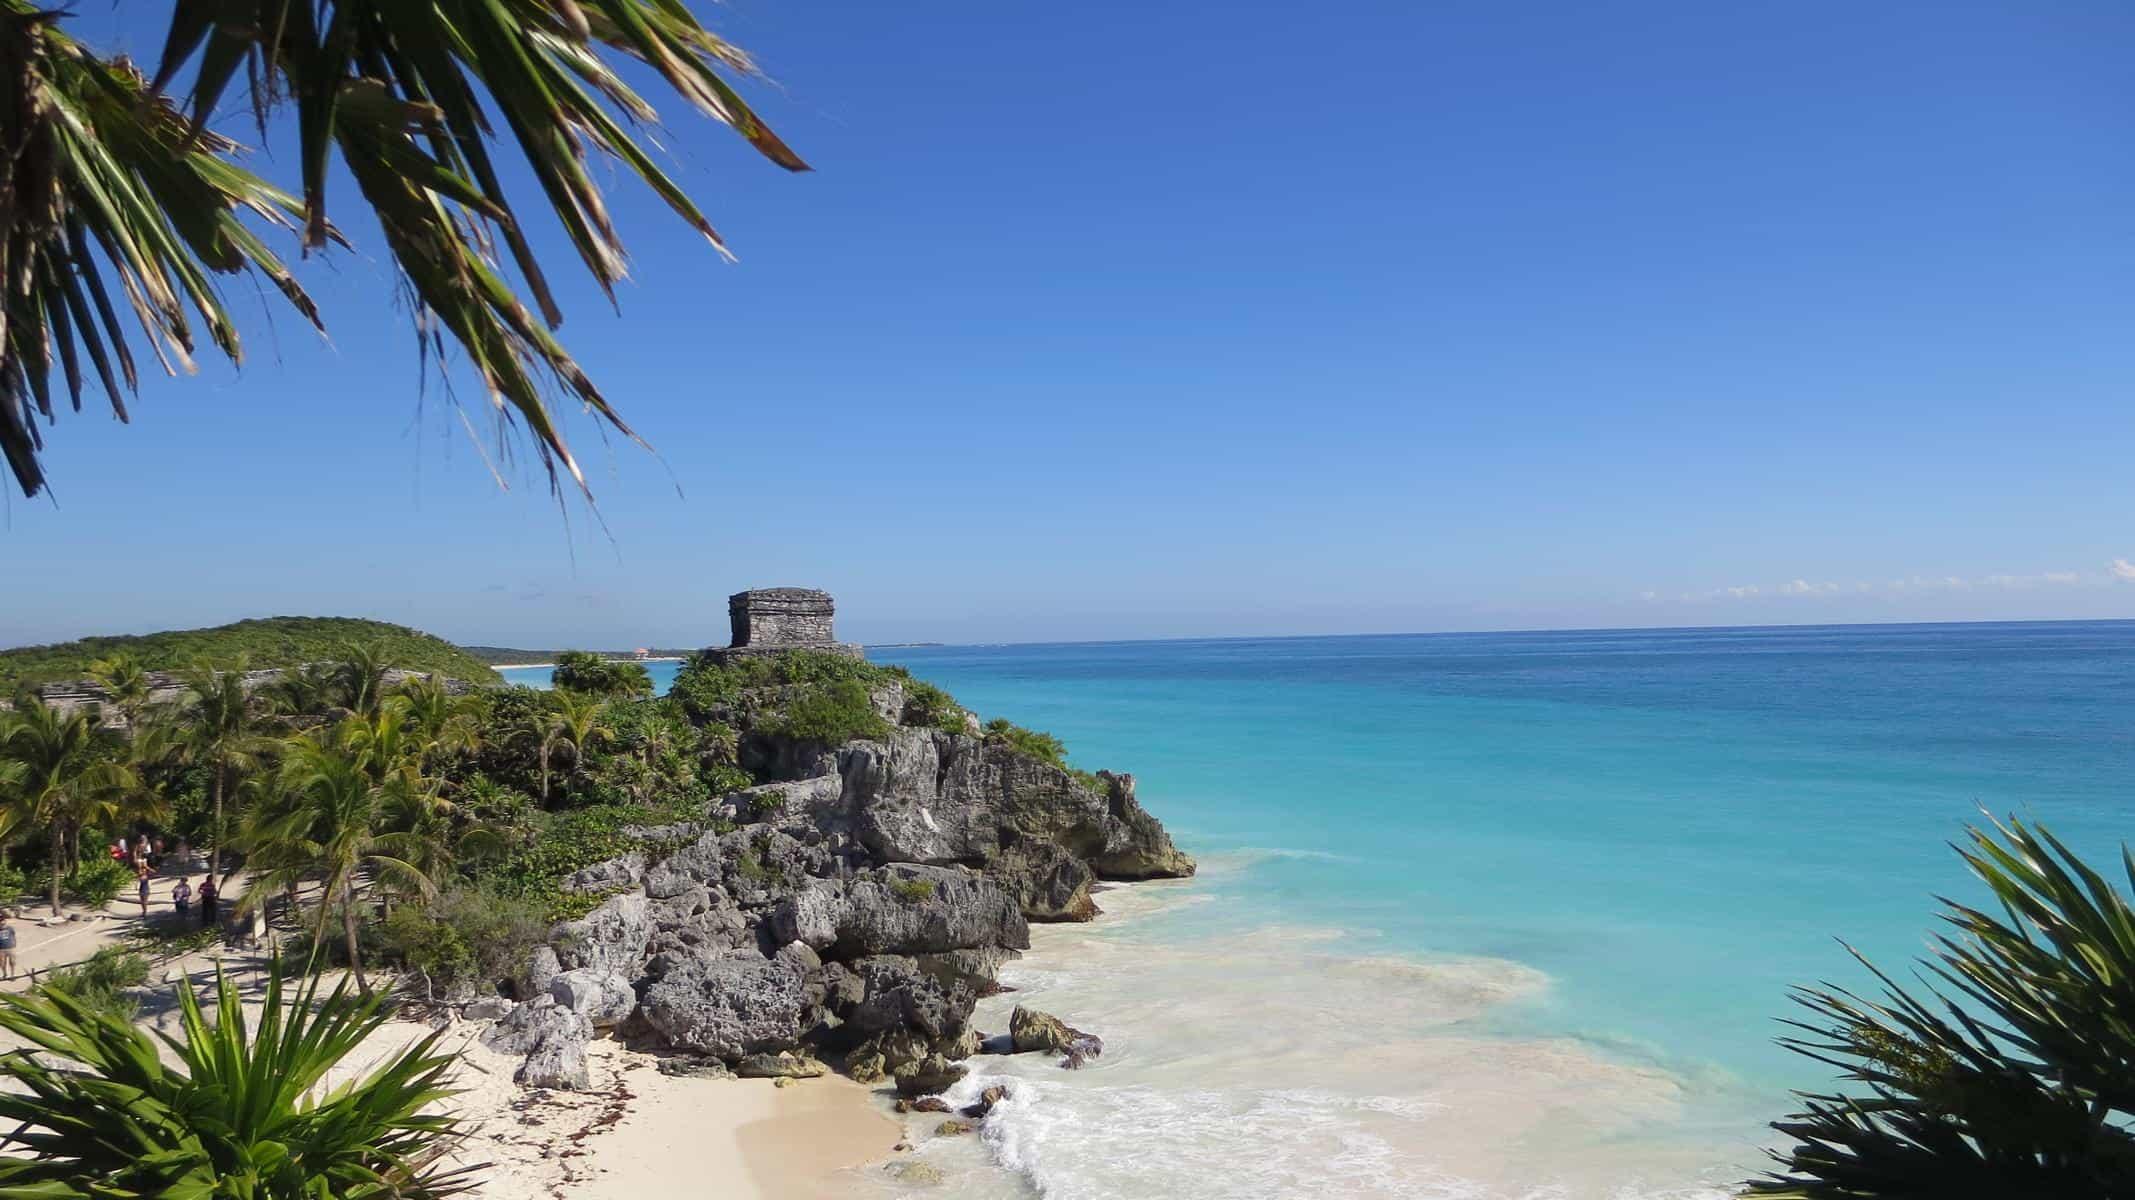 0 Tempel des Windes Maya Staette Tulum Cancun Yucatan Mexiko Karibik Meer